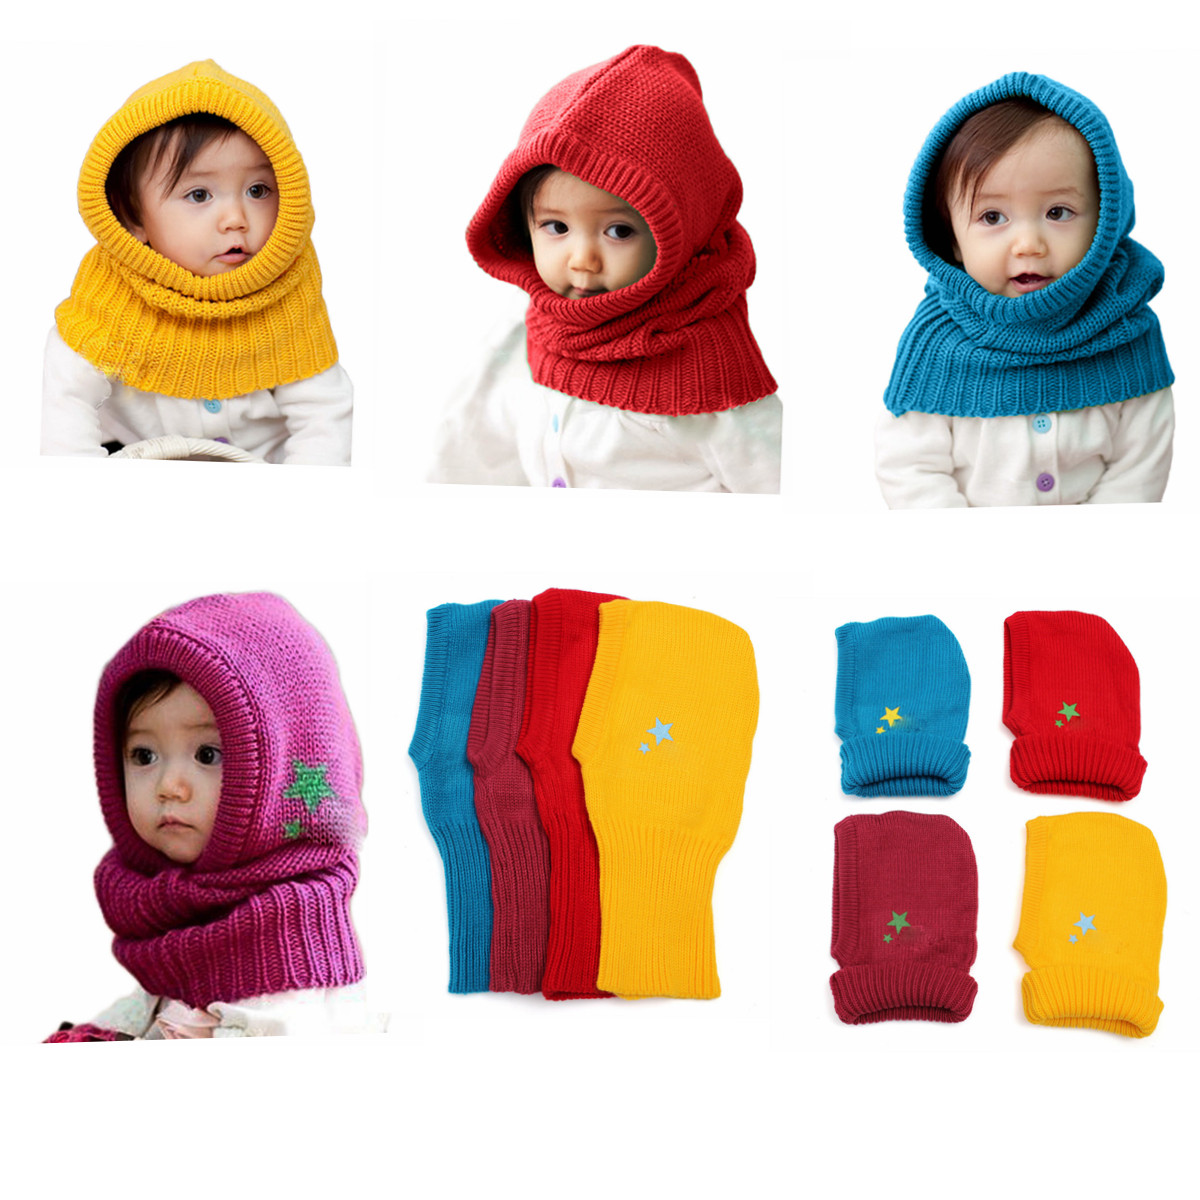 Cute Winter Beanie Crochet Kids Boys Girls Outdoor Warm Hat Hooded Scarf  Wool Earflap Knitted Cover 49ee9b690c69